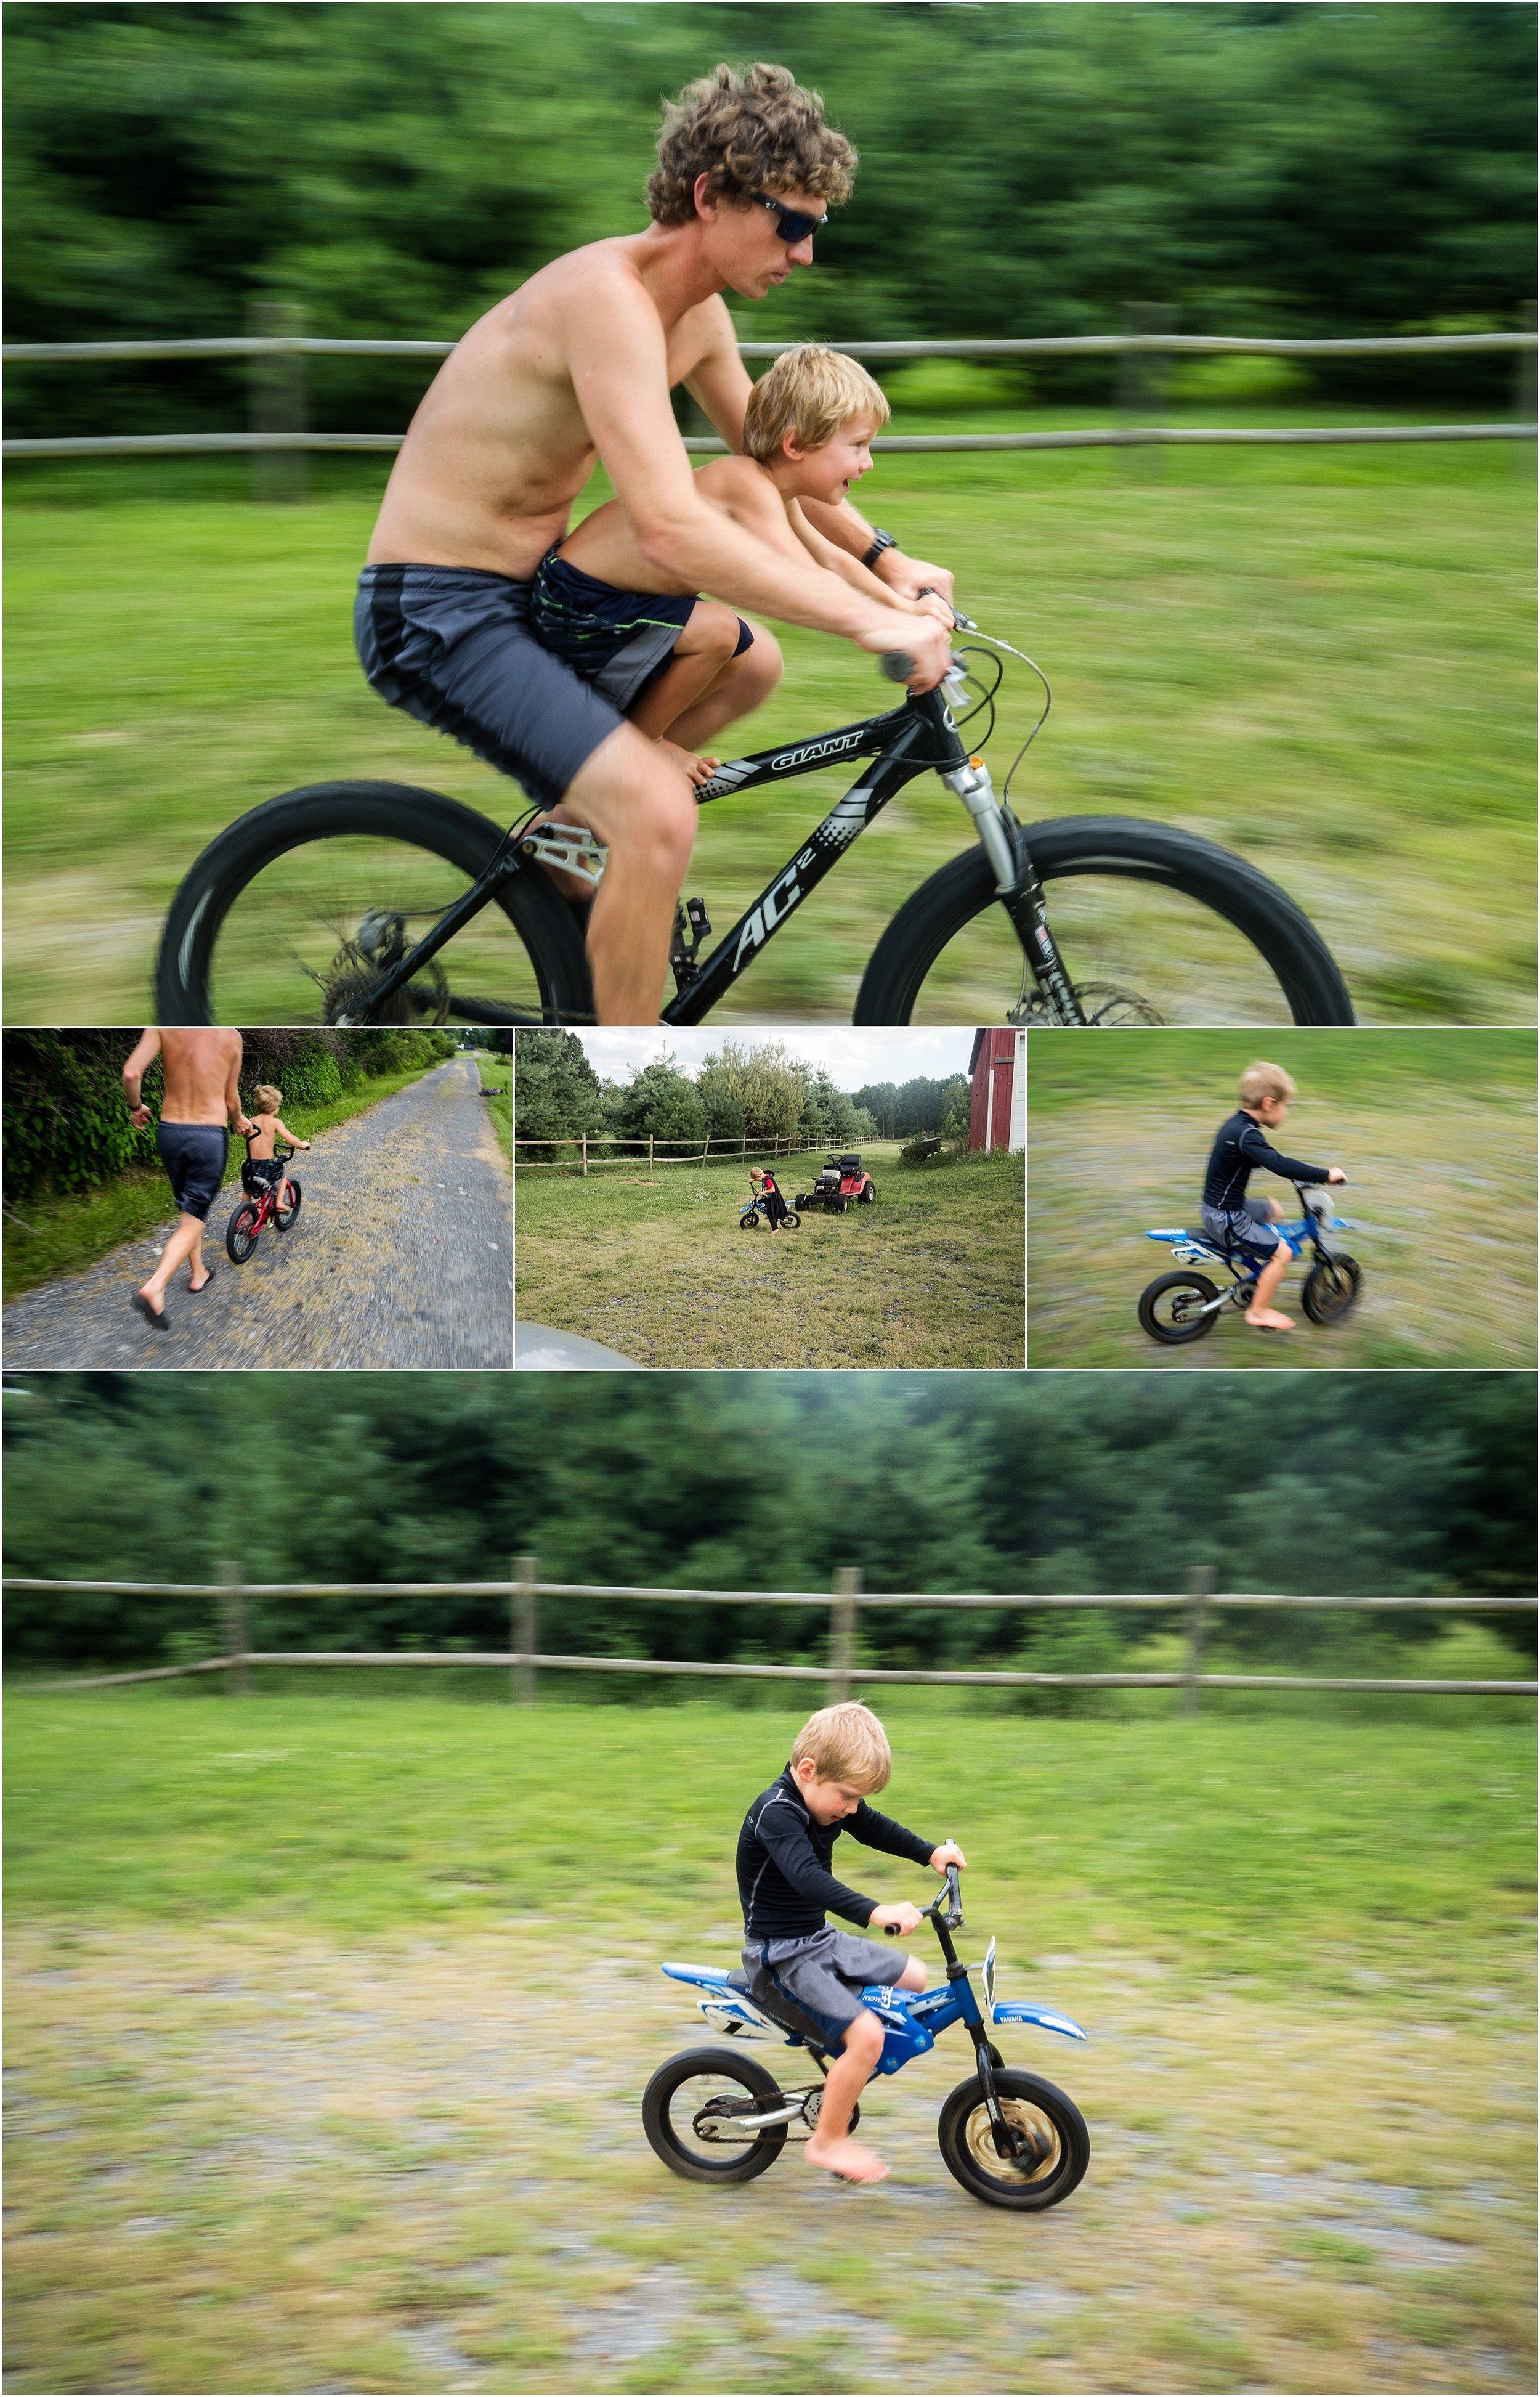 boy riding bike with father